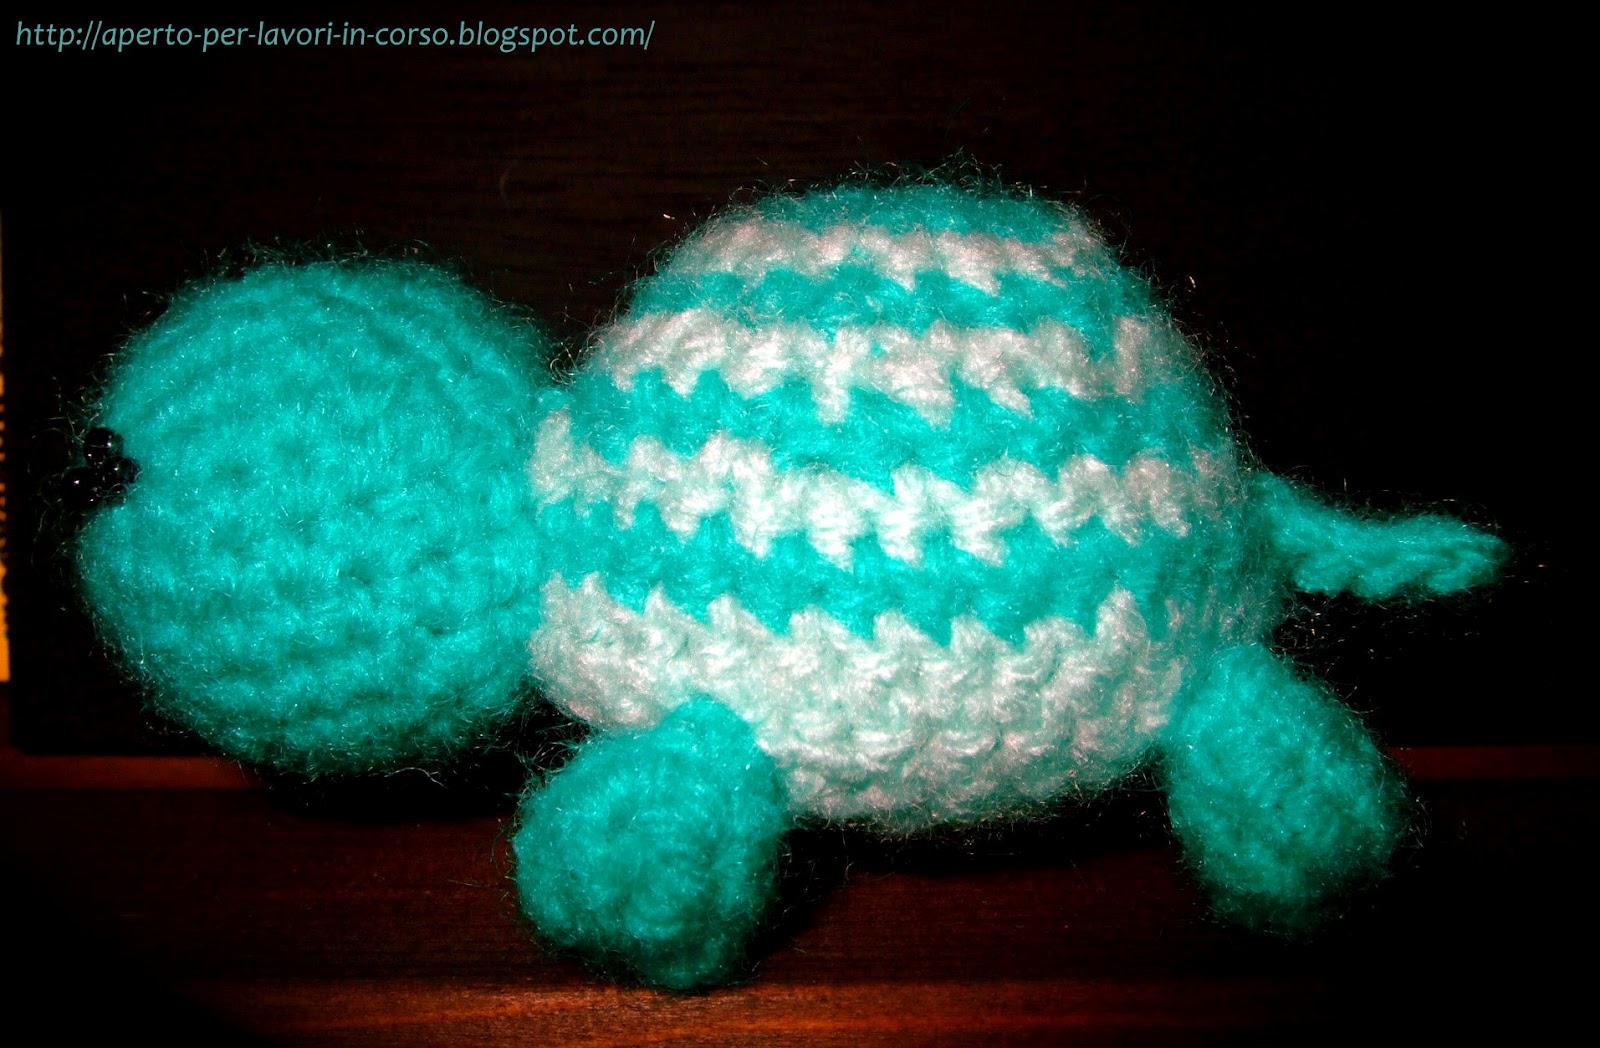 Tartaruga amigurumi all'uncinetto - Crochet amigurumi turtle ... | 1048x1600